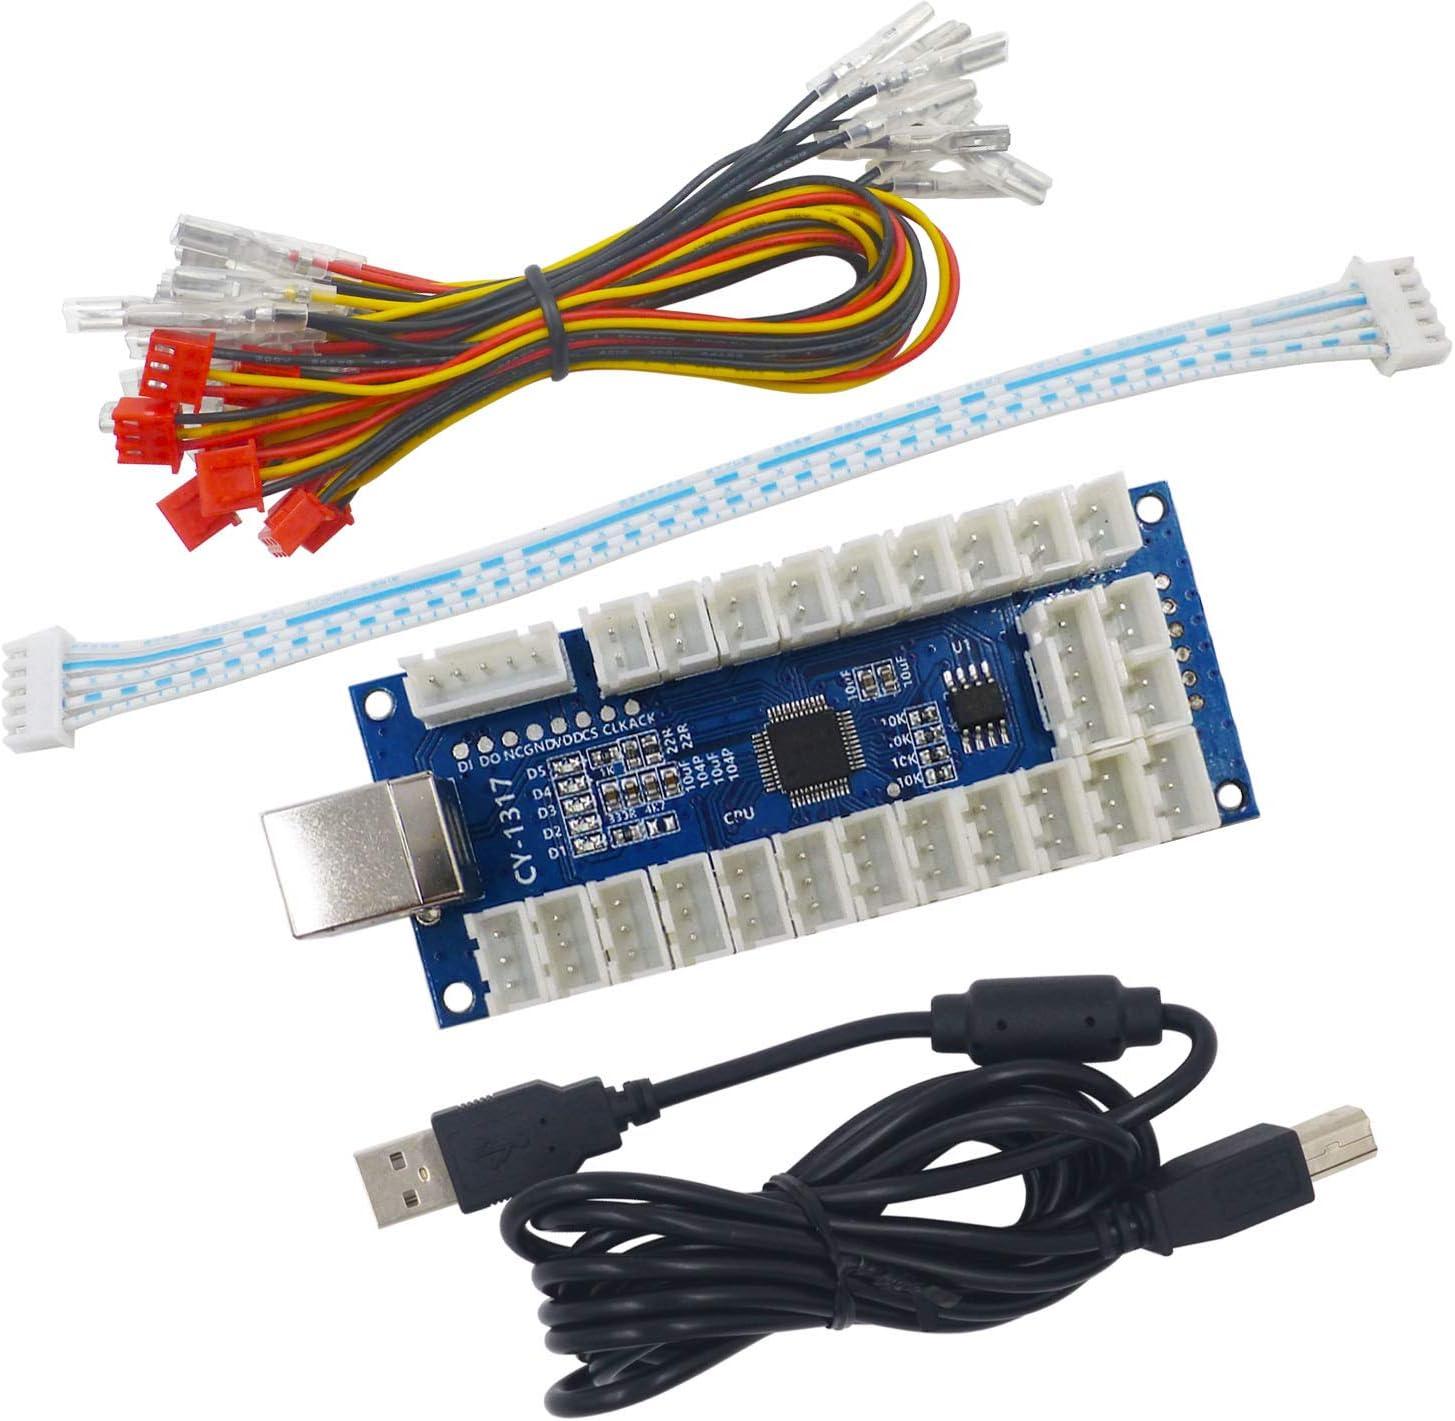 SJ@JX Arcade USB Encoder LED Zero Delay Arcade Controller PC PS3 Android Arcade DIY Kit LED Arcade LED Button